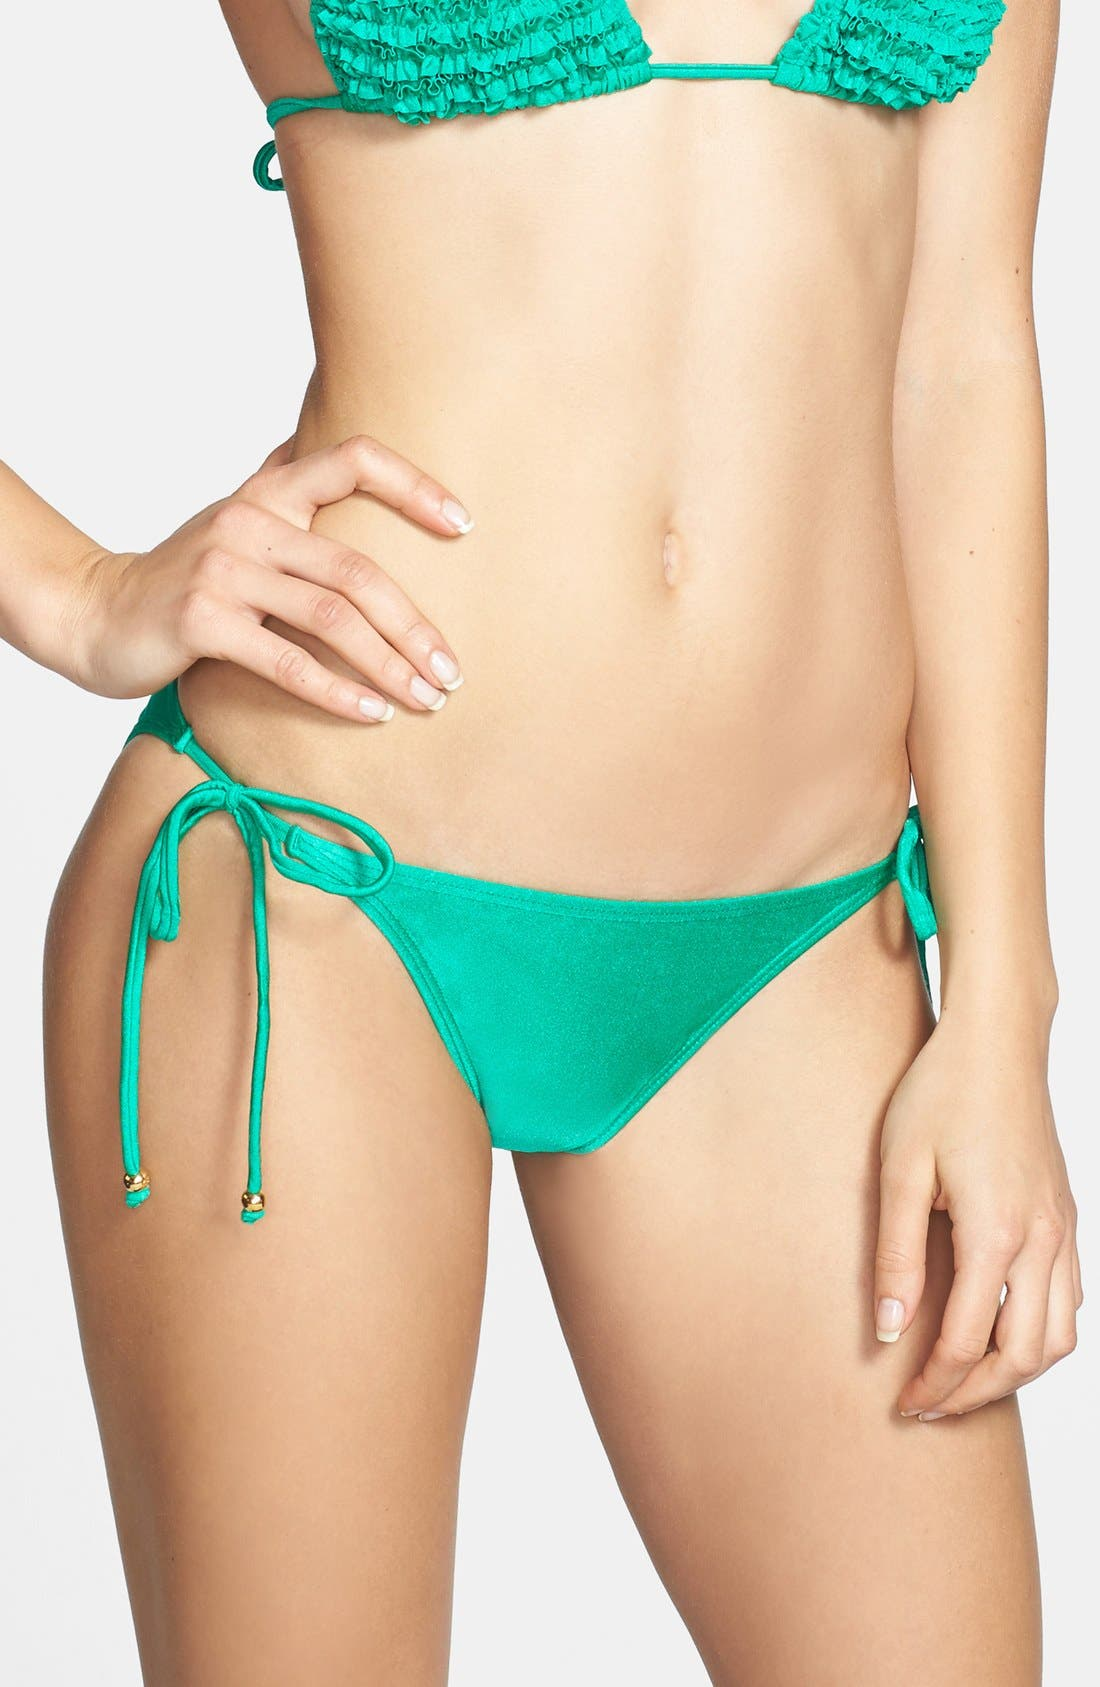 Alternate Image 1 Selected - PilyQ 'Green Jade' Side Tie Bikini Bottoms